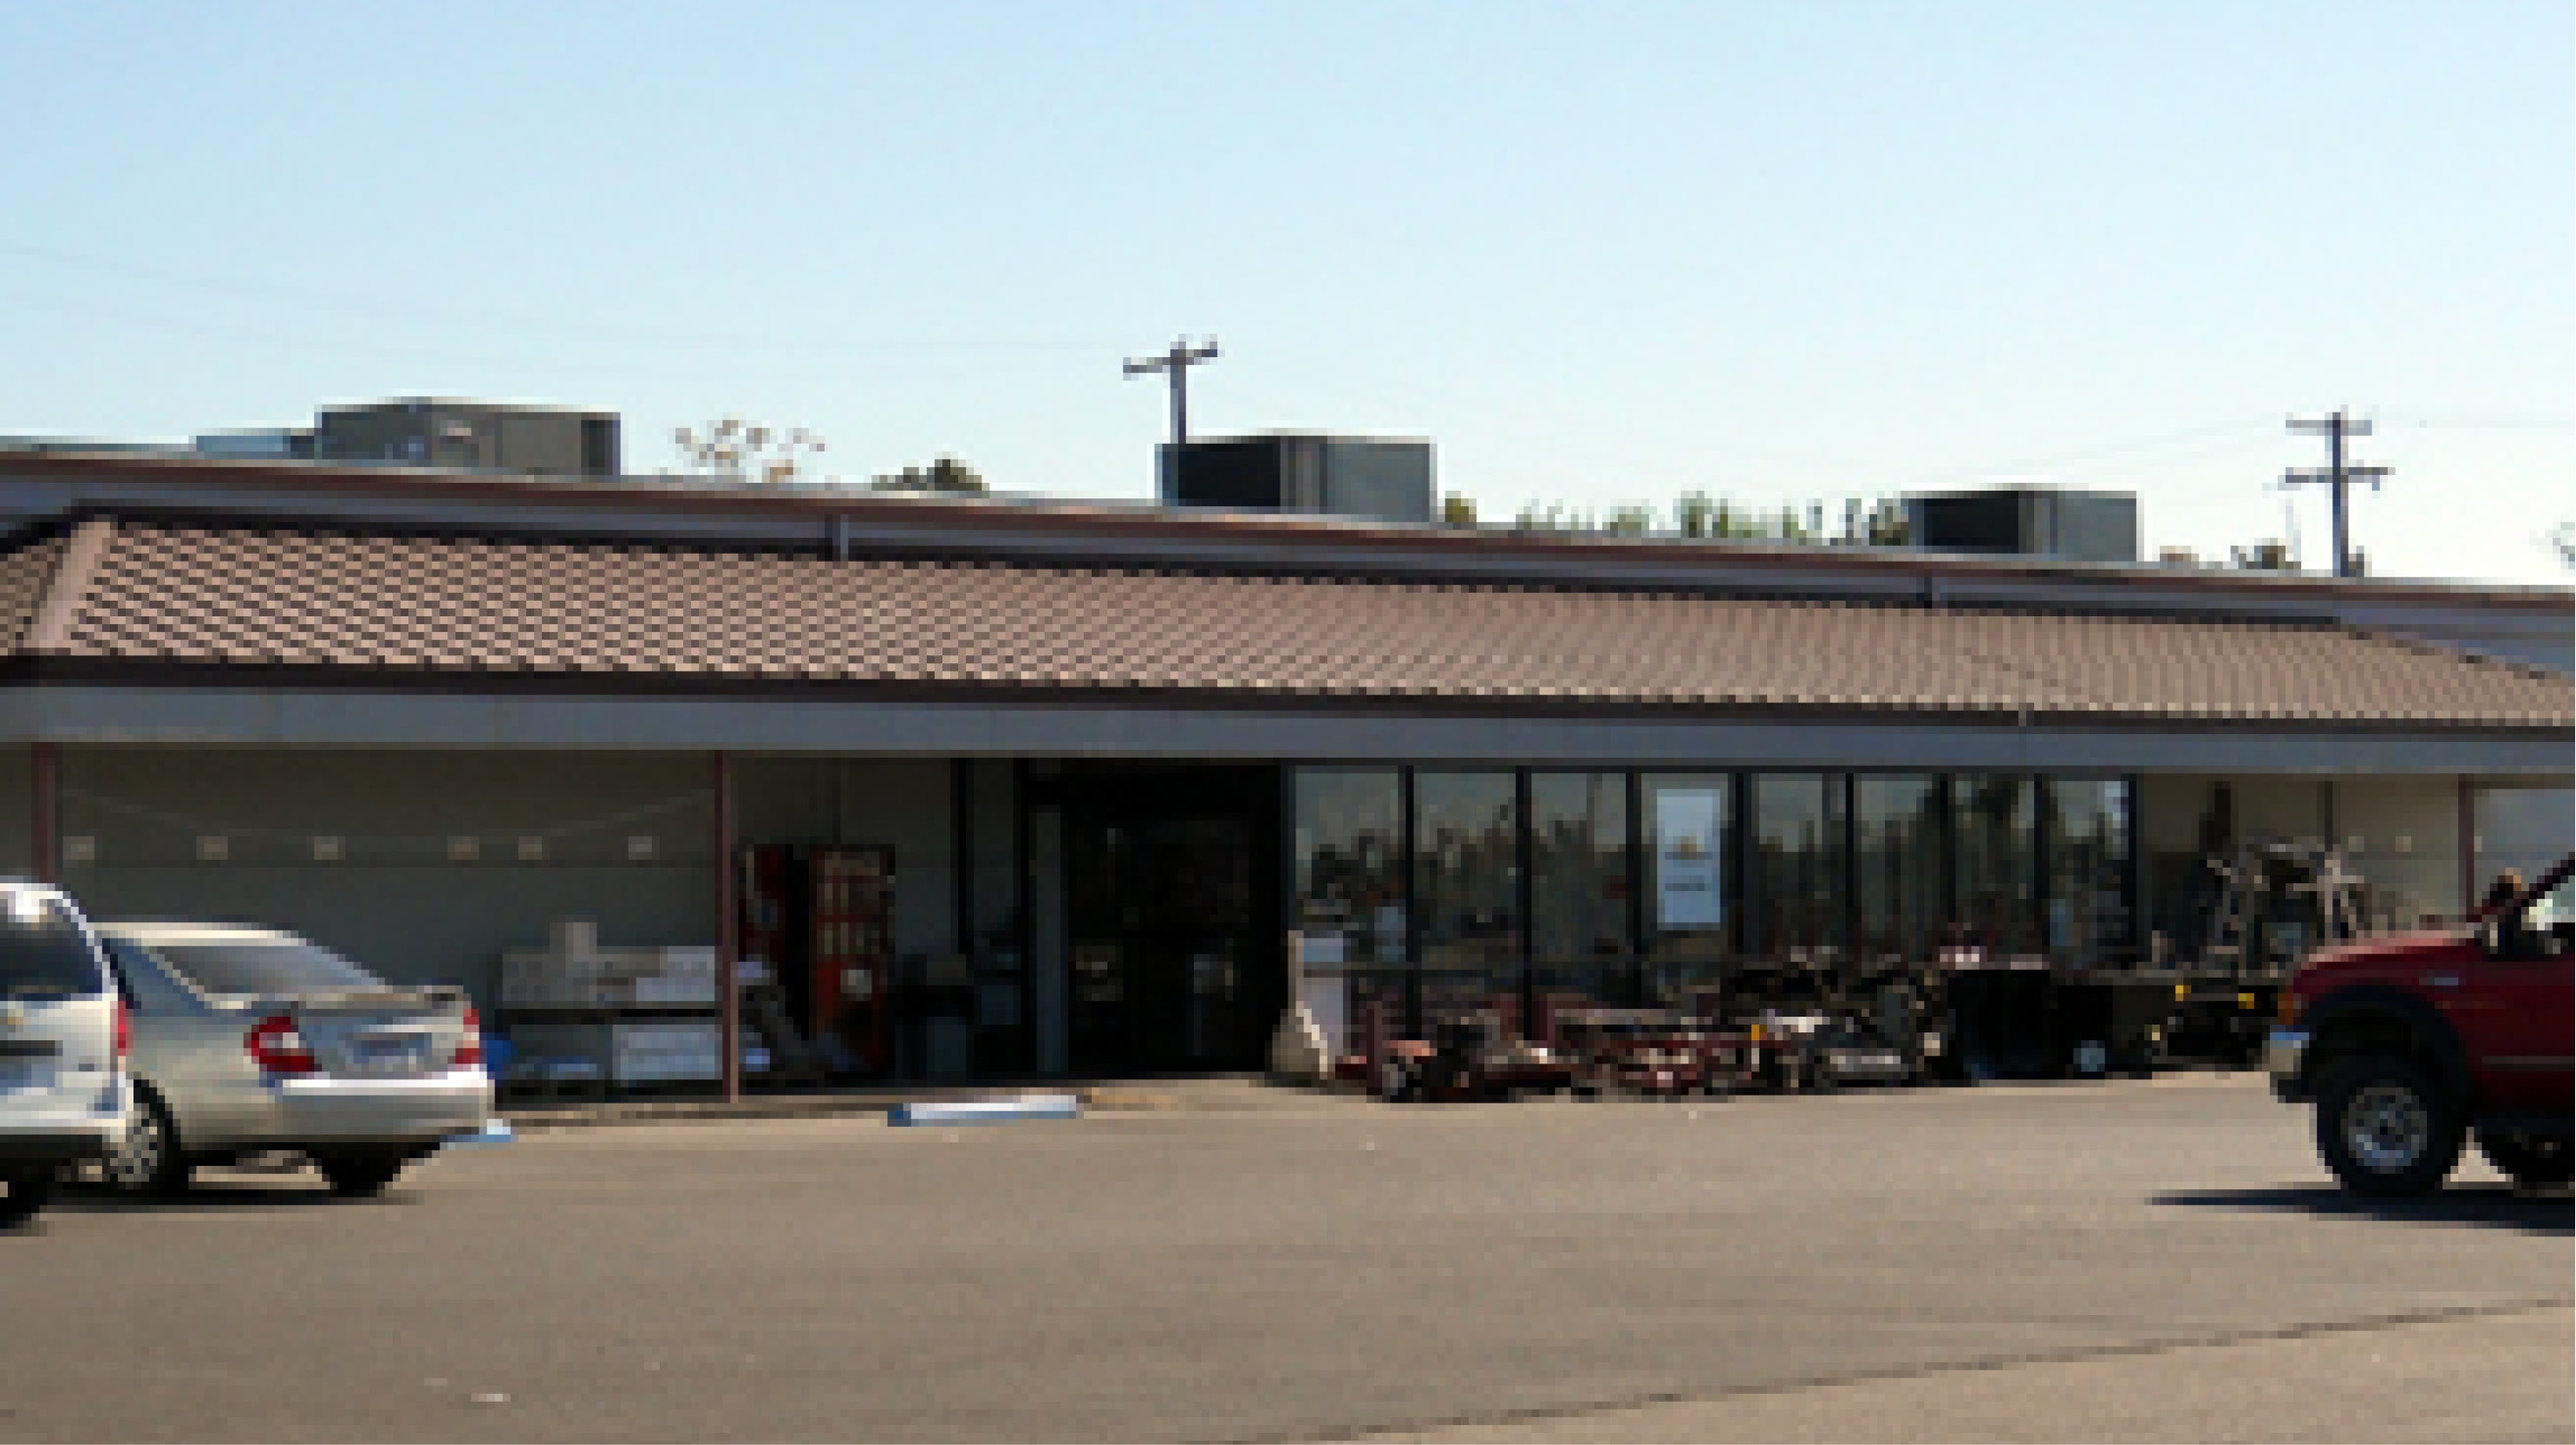 Front view of Orscheln Farm & Home Store in Sikeston, Missouri 63801